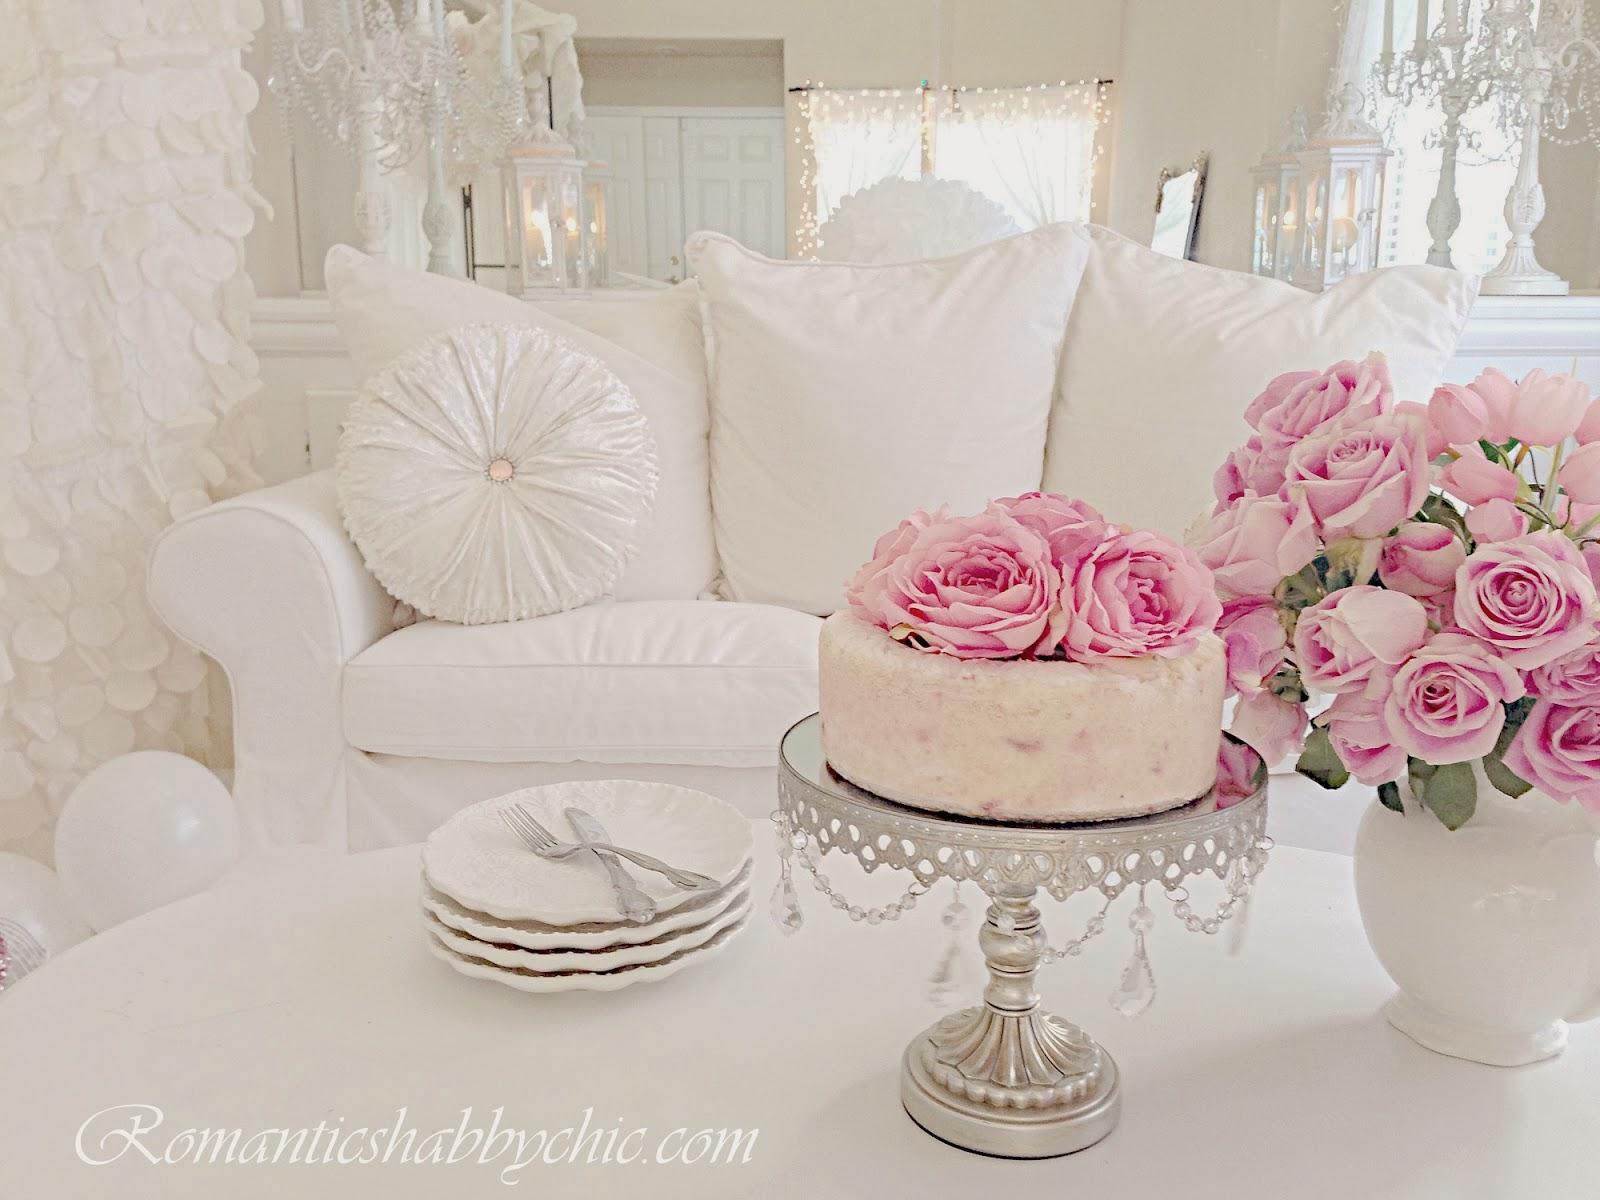 Romantic Shabby Chic Home: Romantic Shabby Chic blog